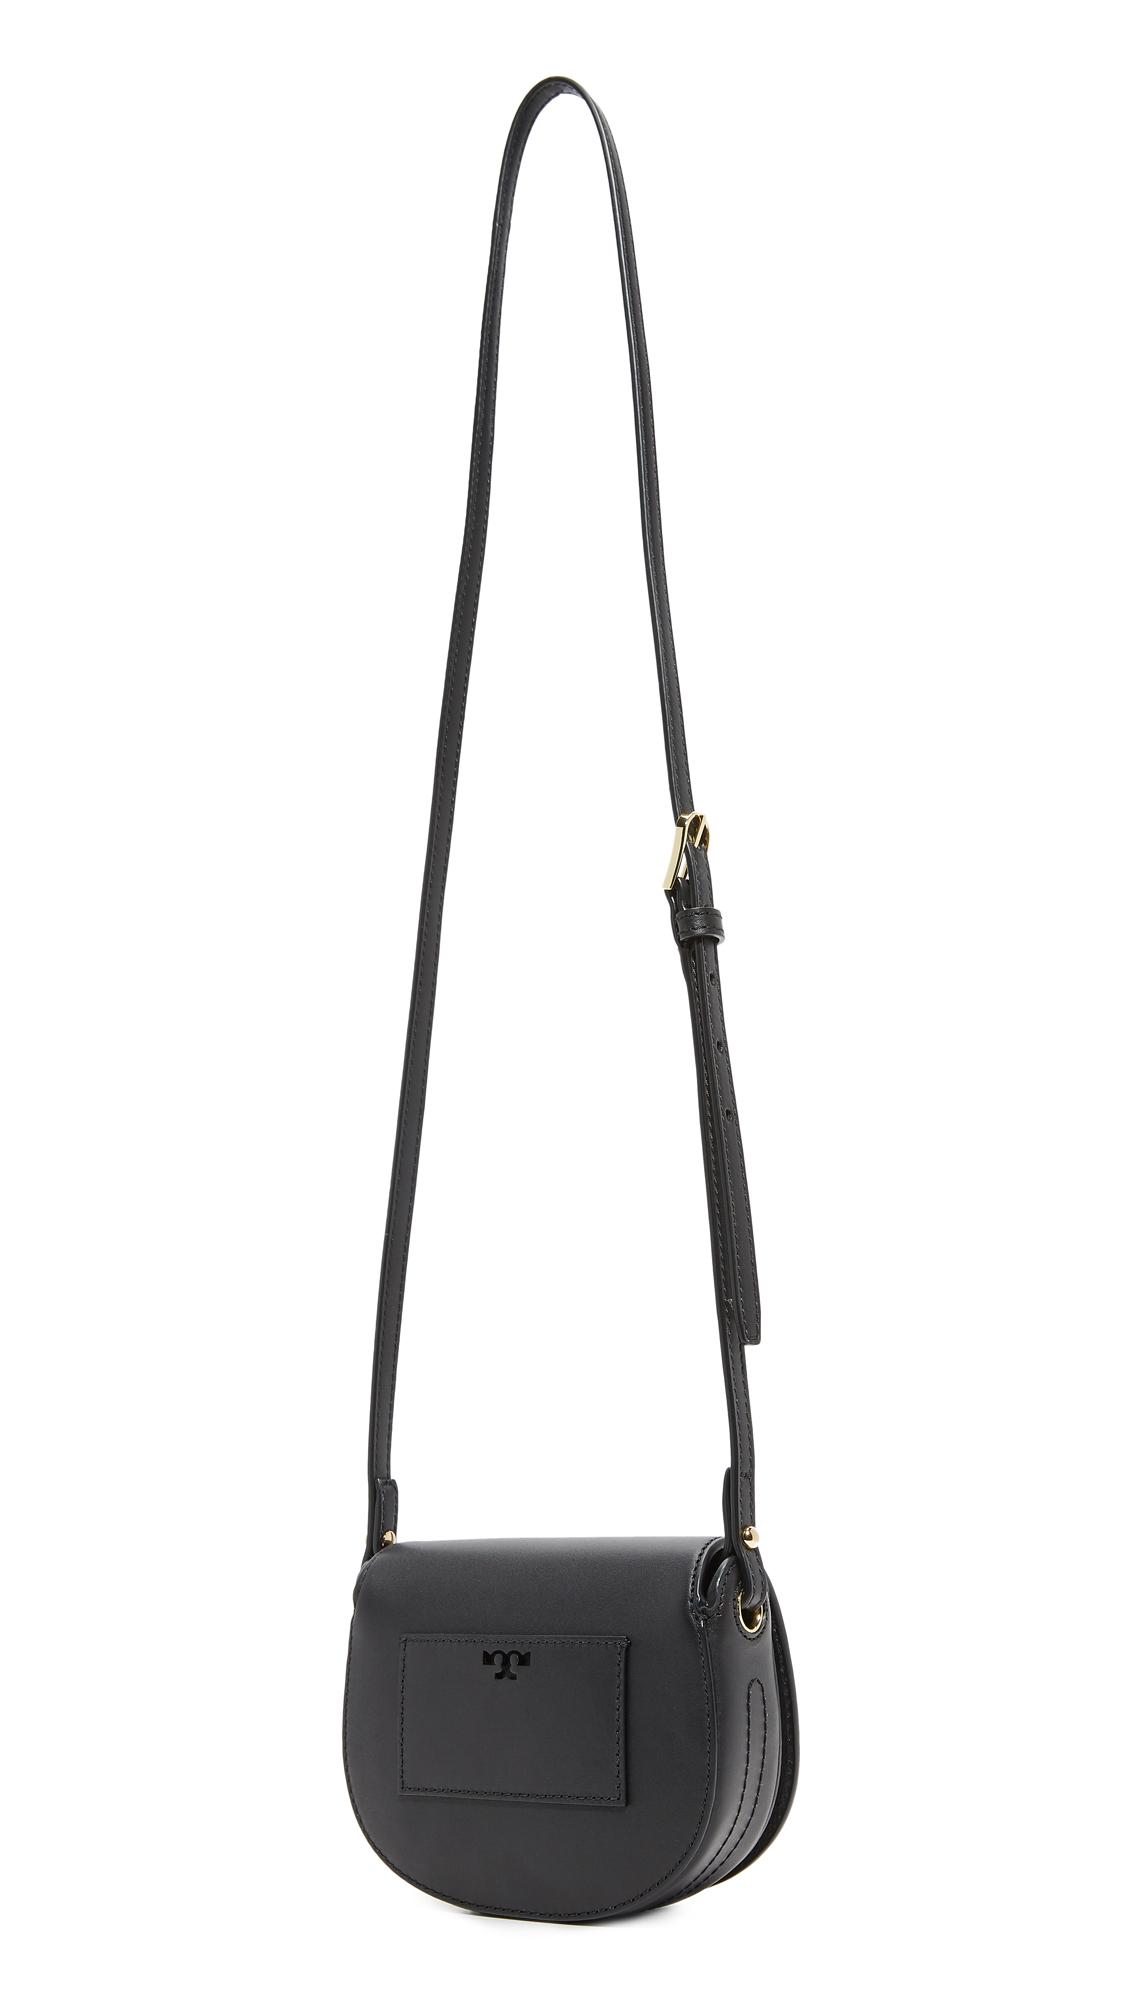 beab89715f Tory Burch Mini Saddle Bag